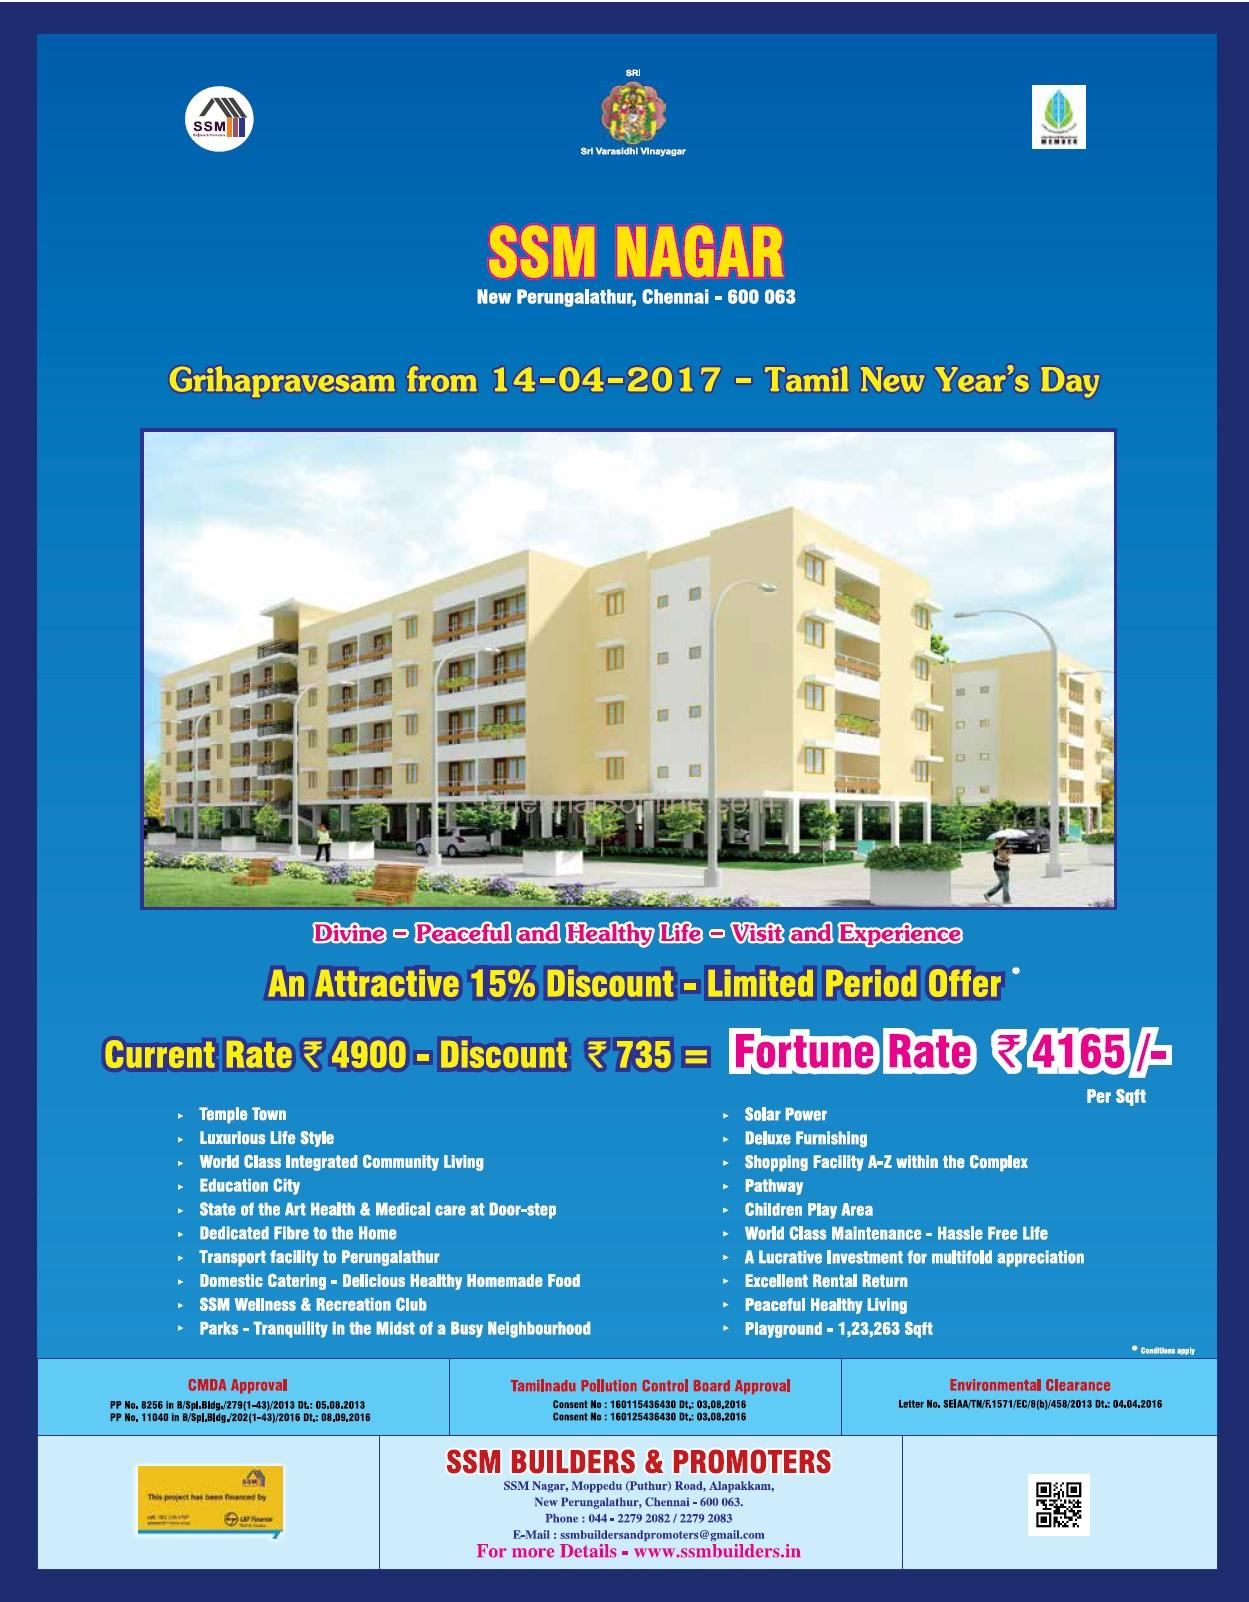 Properties in Perungalathur, Chennai